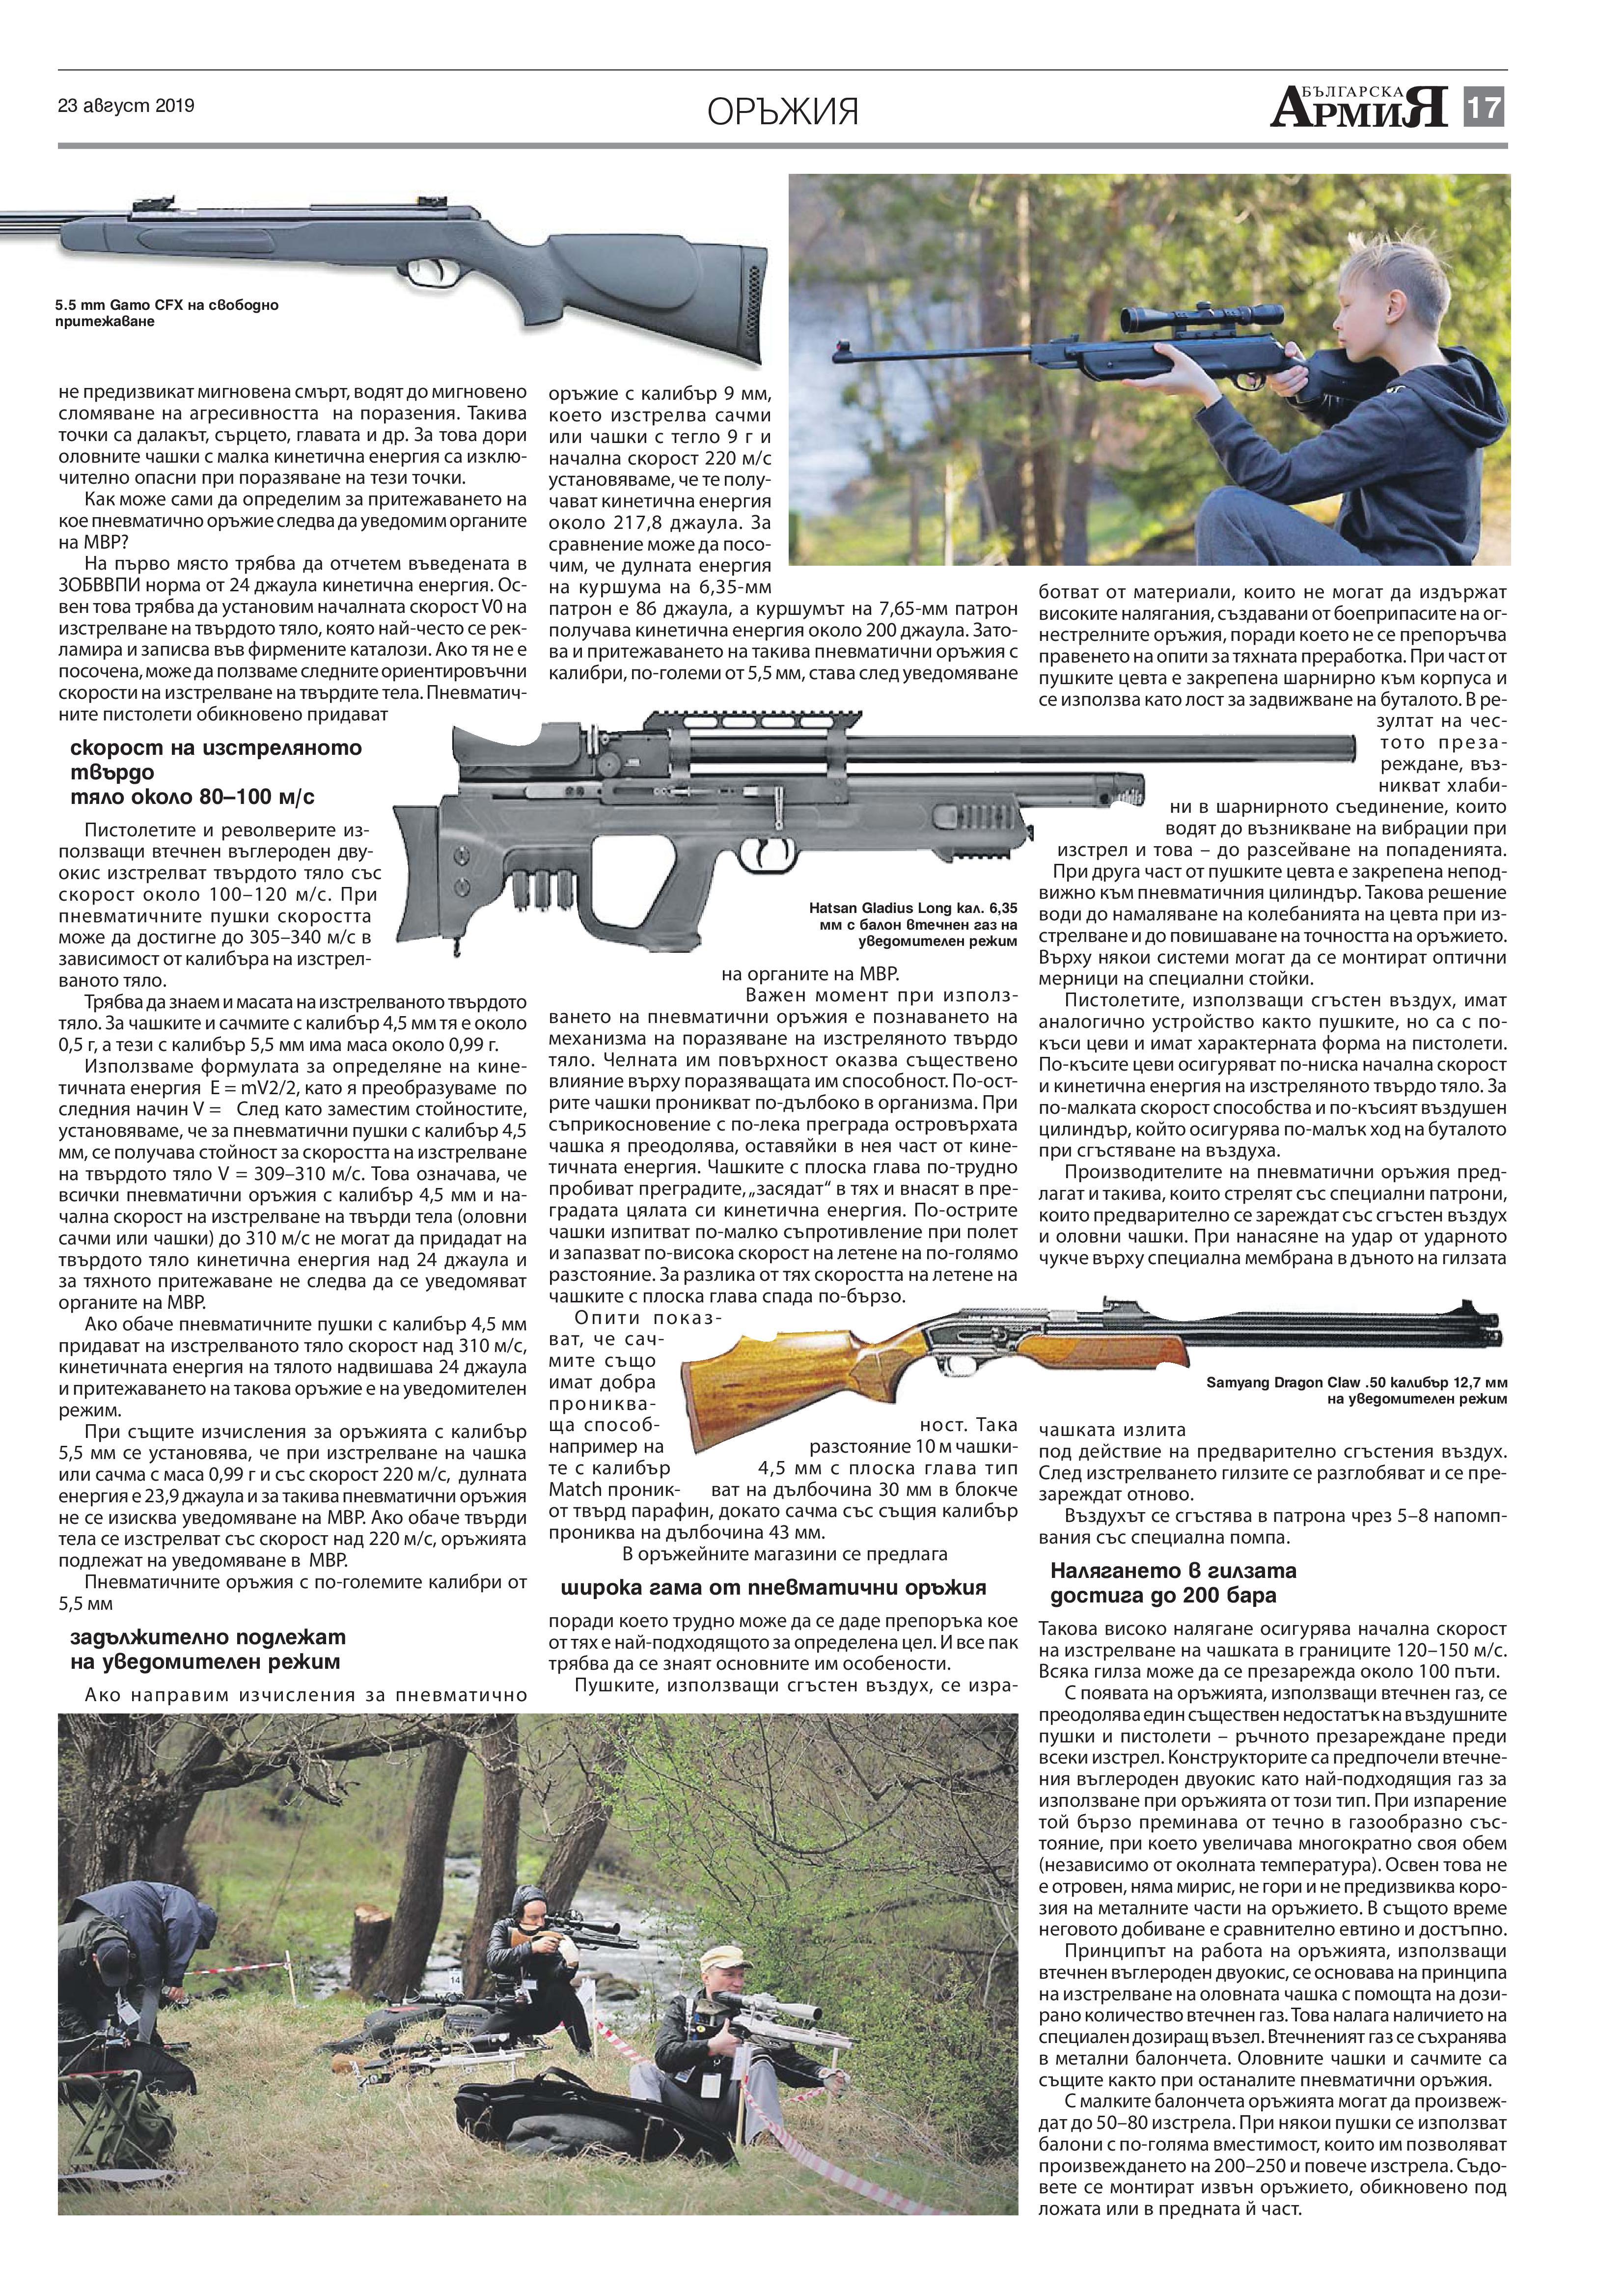 https://armymedia.bg/wp-content/uploads/2015/06/17-30.jpg